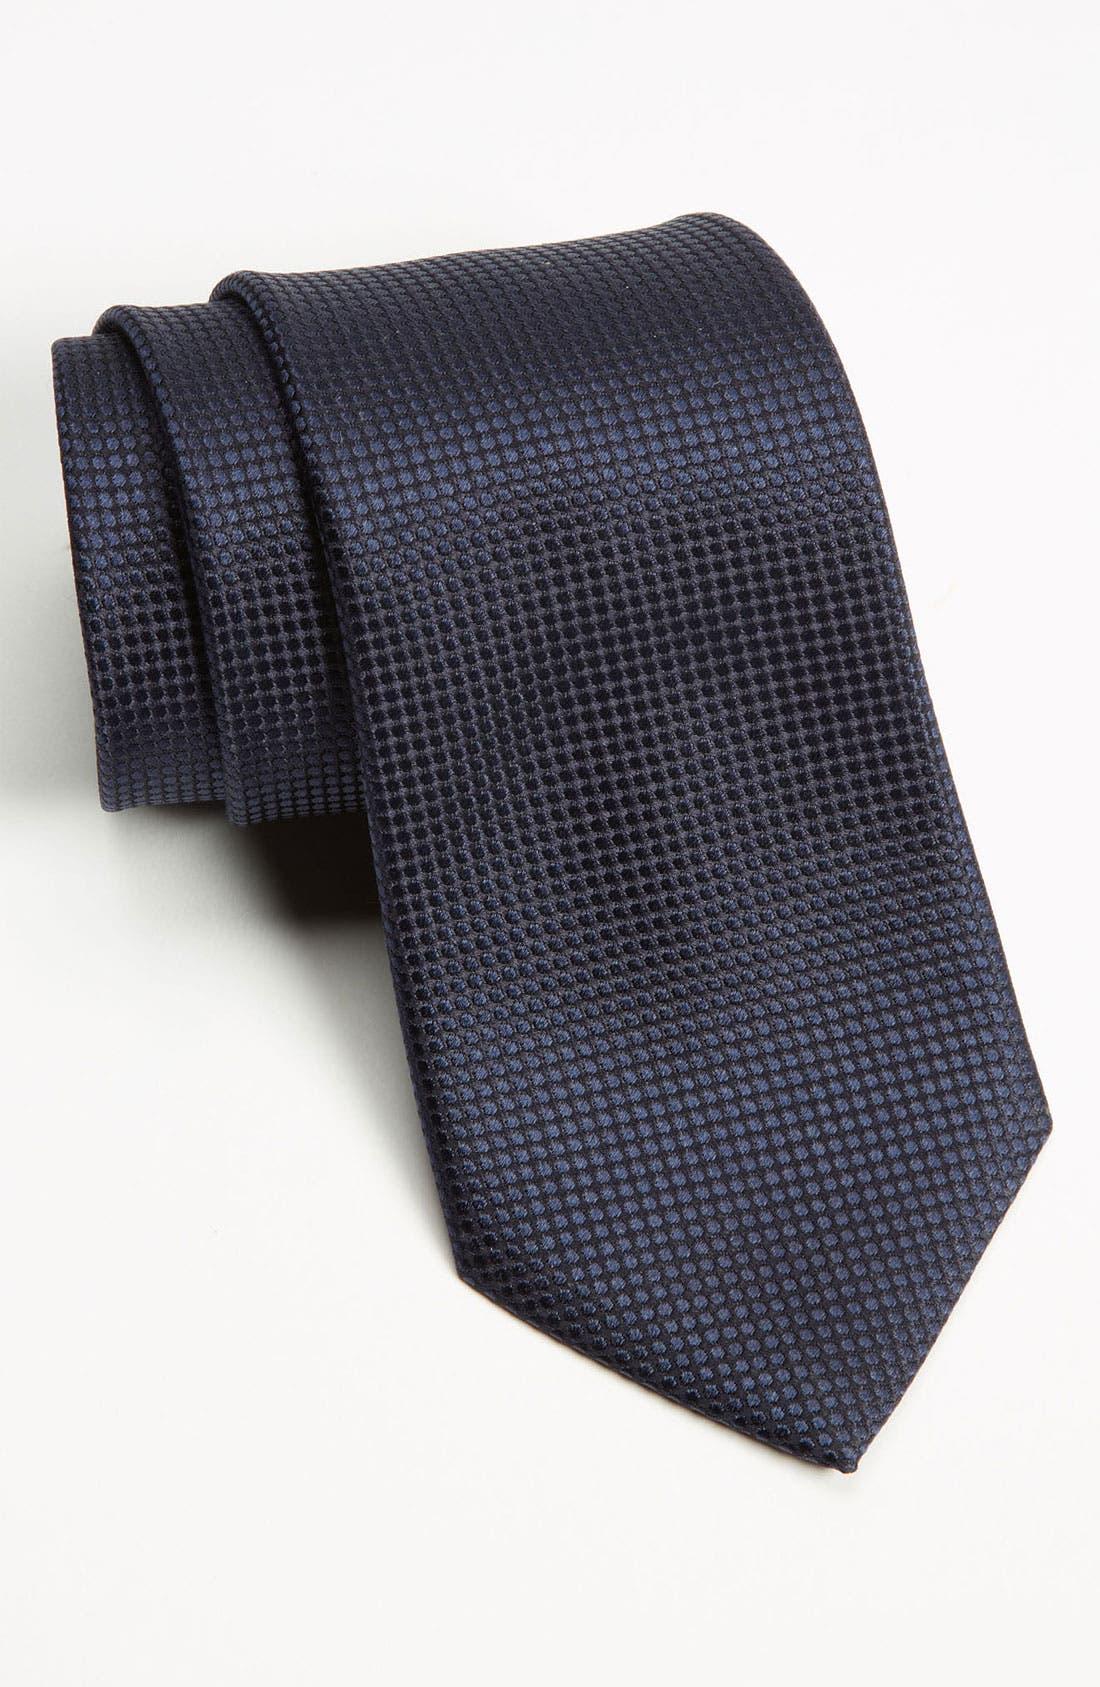 Alternate Image 1 Selected - Z Zegna Dot Woven Silk Tie